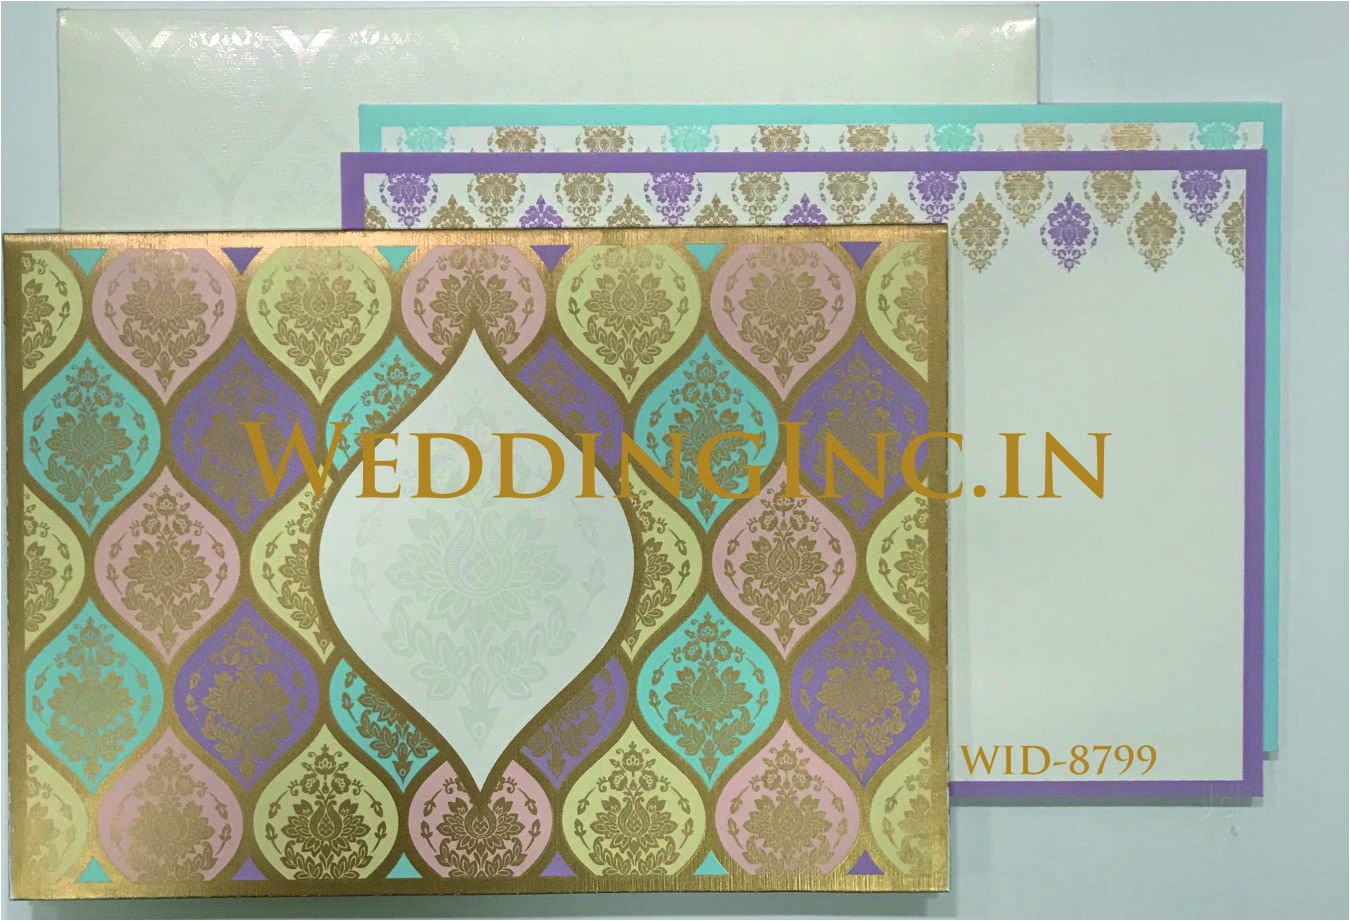 wedding inc andheri west mumbai wedding card printers lvg0s0lsh6 jpg